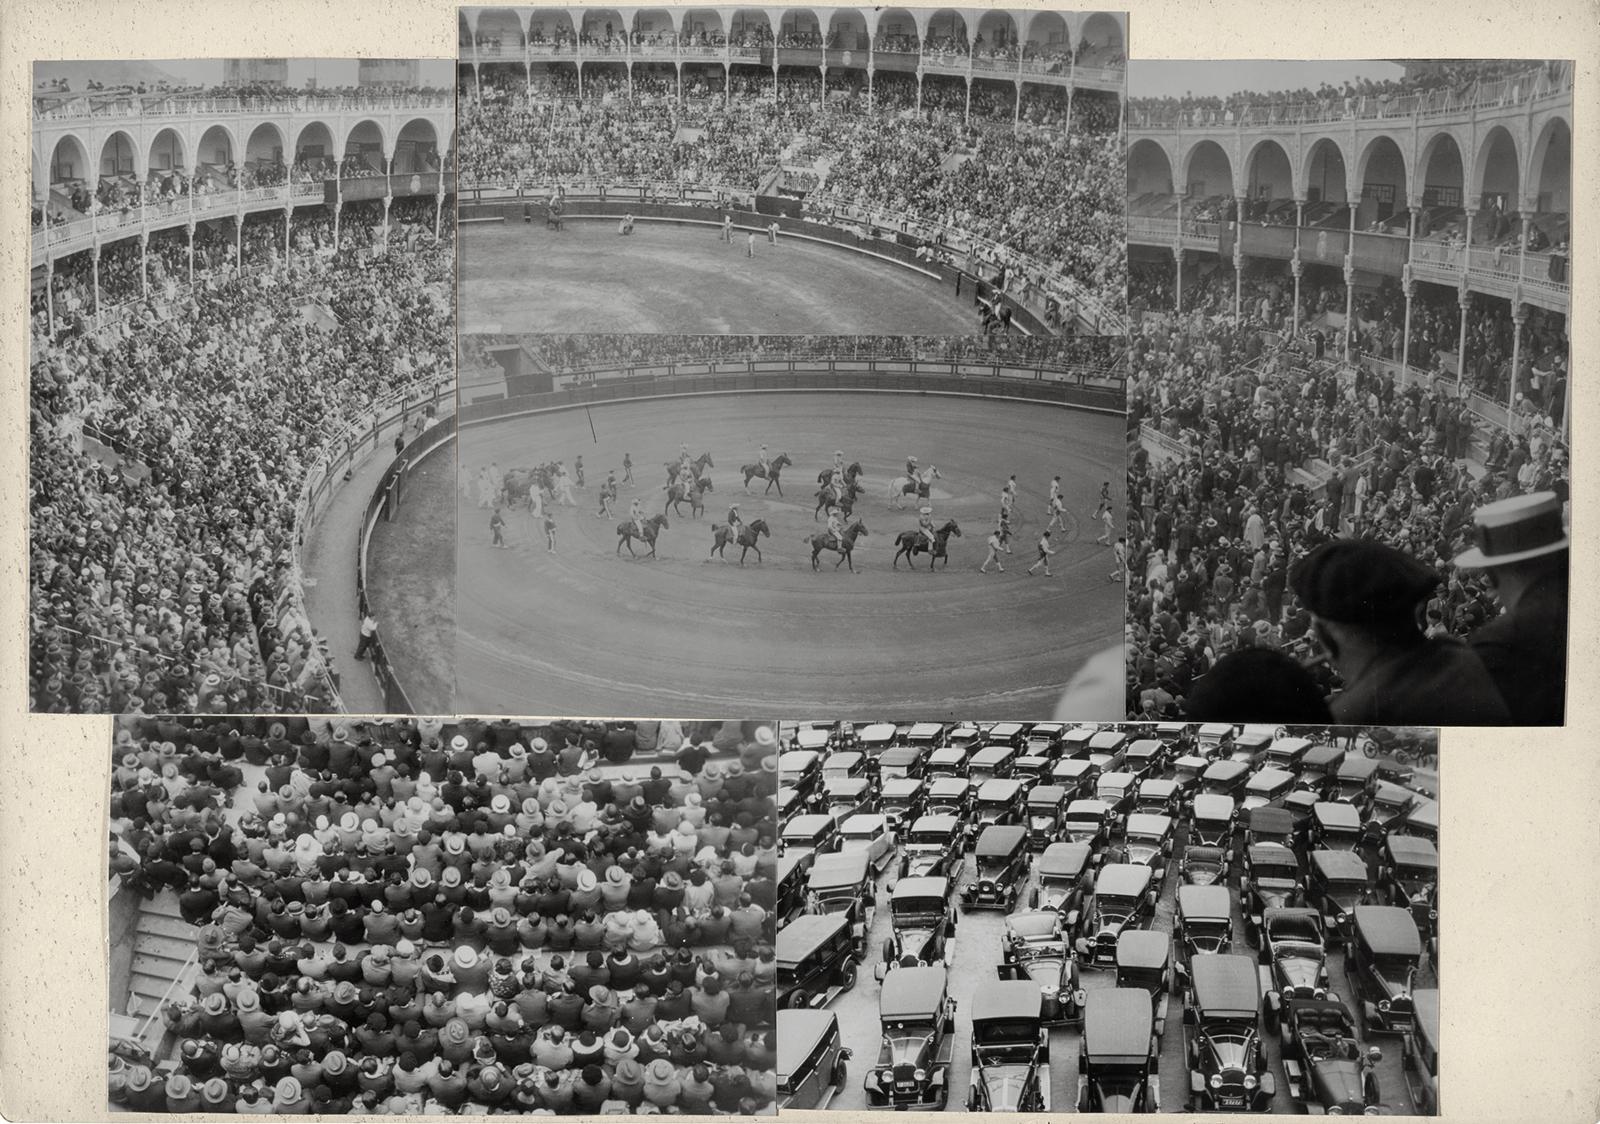 albers-bullfight